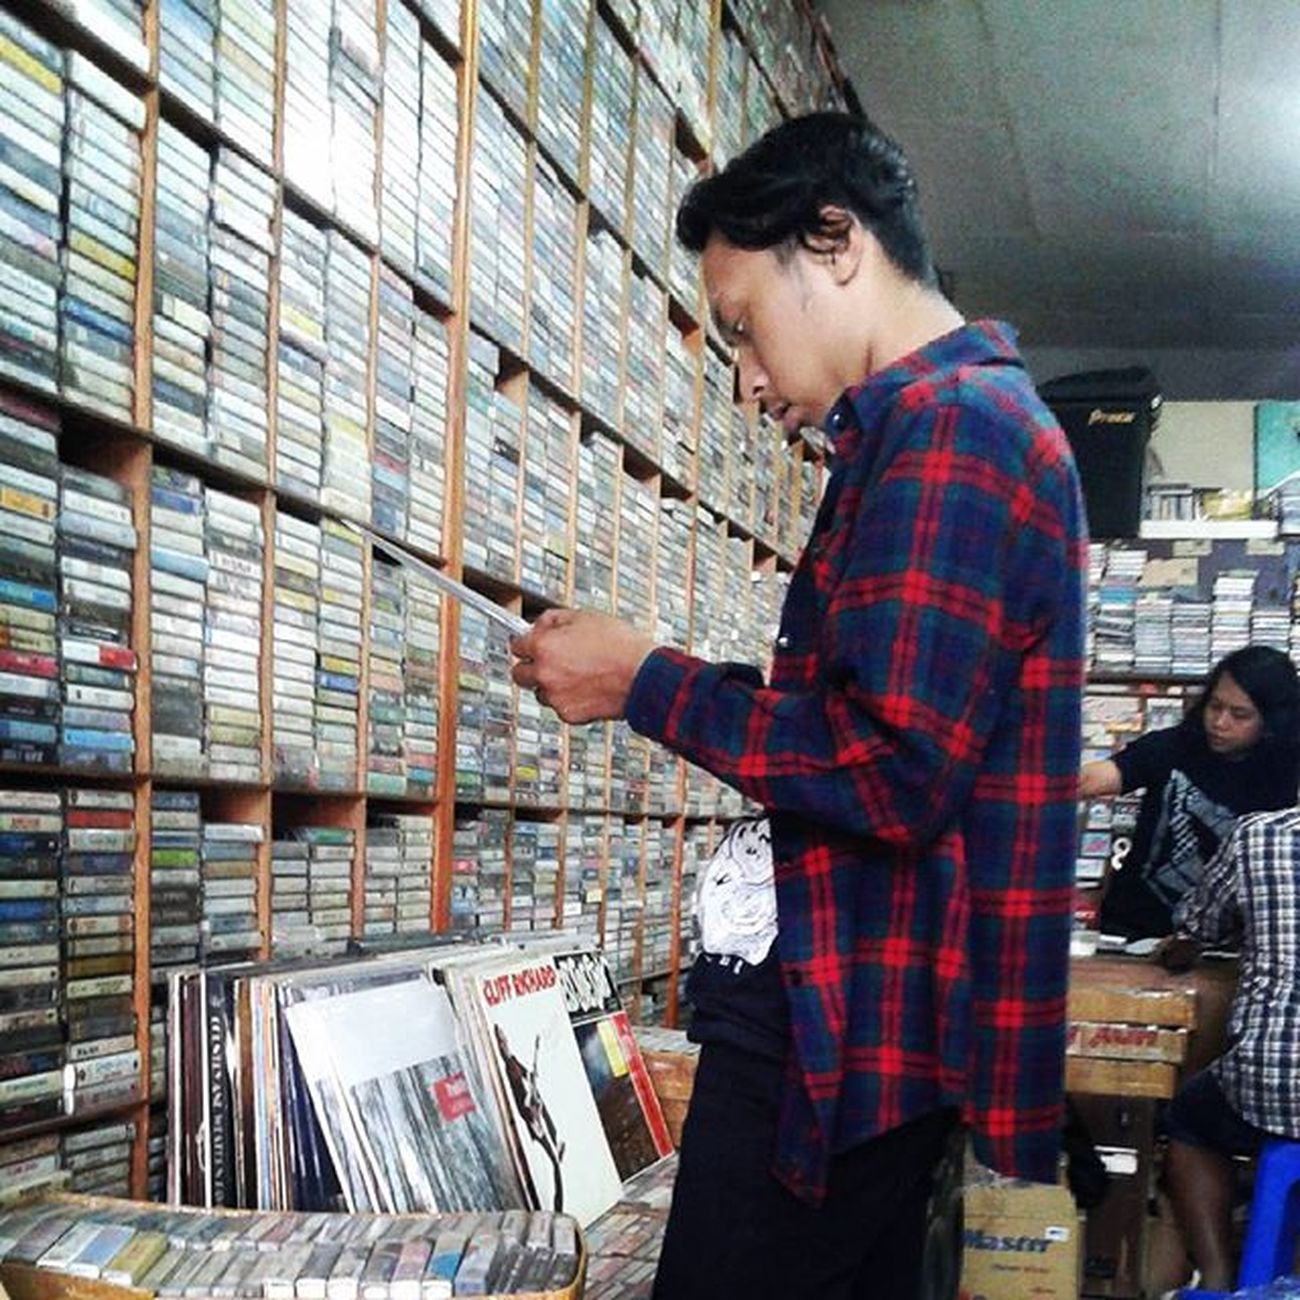 Senin lalu. Migren kalo udah liat yg beginian pengenya sih dibeli semua sama toko tokonya tapi sayangnya kantong kresek tak memadai 😄😜😱😬👅👄😍😘📼💿 Dumusik Cassete Cd Vinyl Sagalaayadaaslinik Jajanrock Migren Hayangkabeh Hahaha Dipatiukur Bandung Westjava